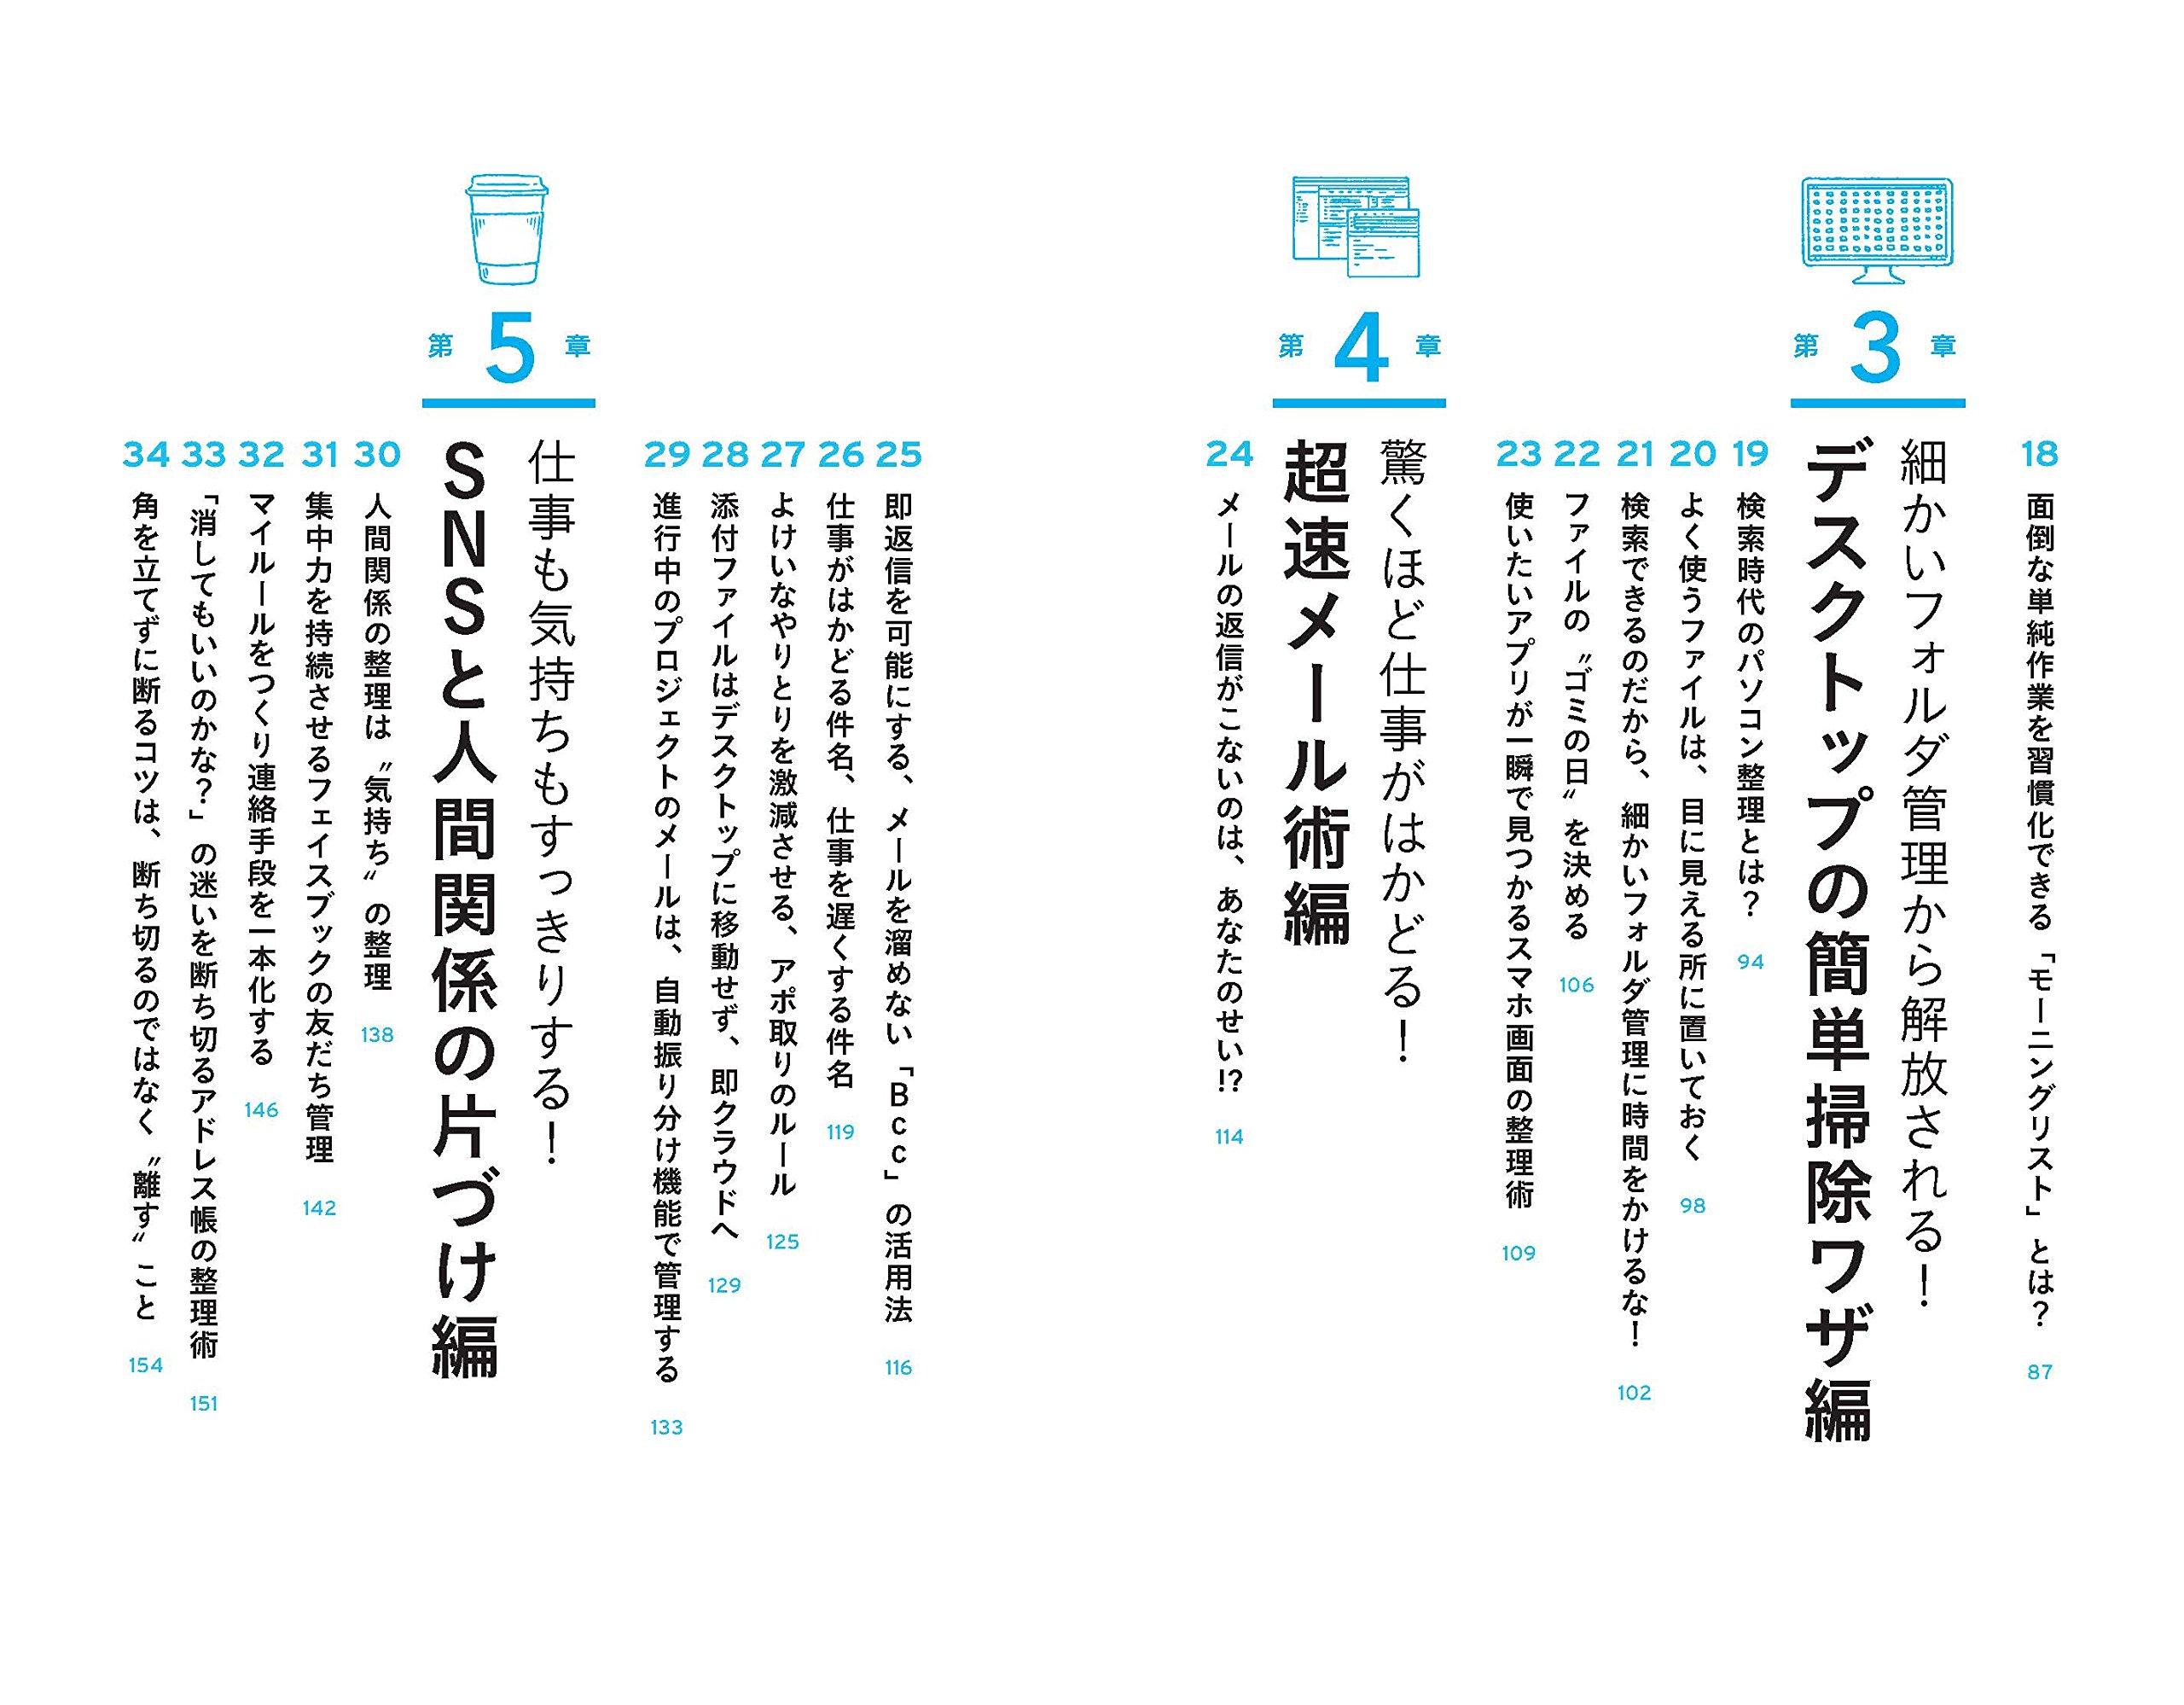 3e4ae098ec 仕事が速い人ほど無駄な時間を使わない! 超速片づけ仕事術 | 美崎 栄一郎 |本 | 通販 | Amazon